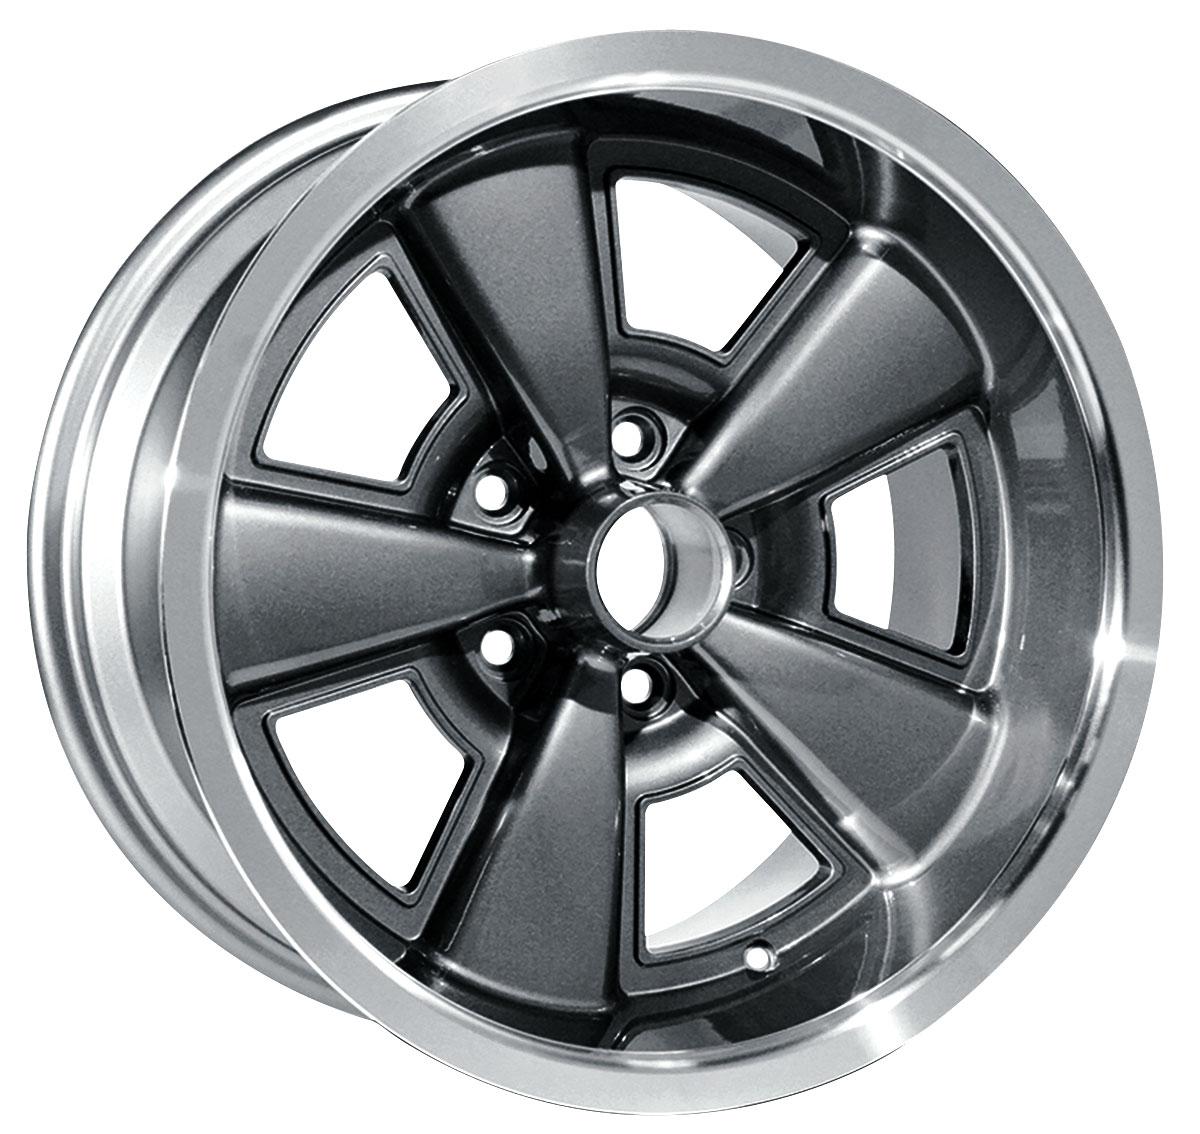 "Aluminum Rally Wheel, 1971-72 CH/EC/MC, Gunmetal, 17x8, 4.50"" B.S."